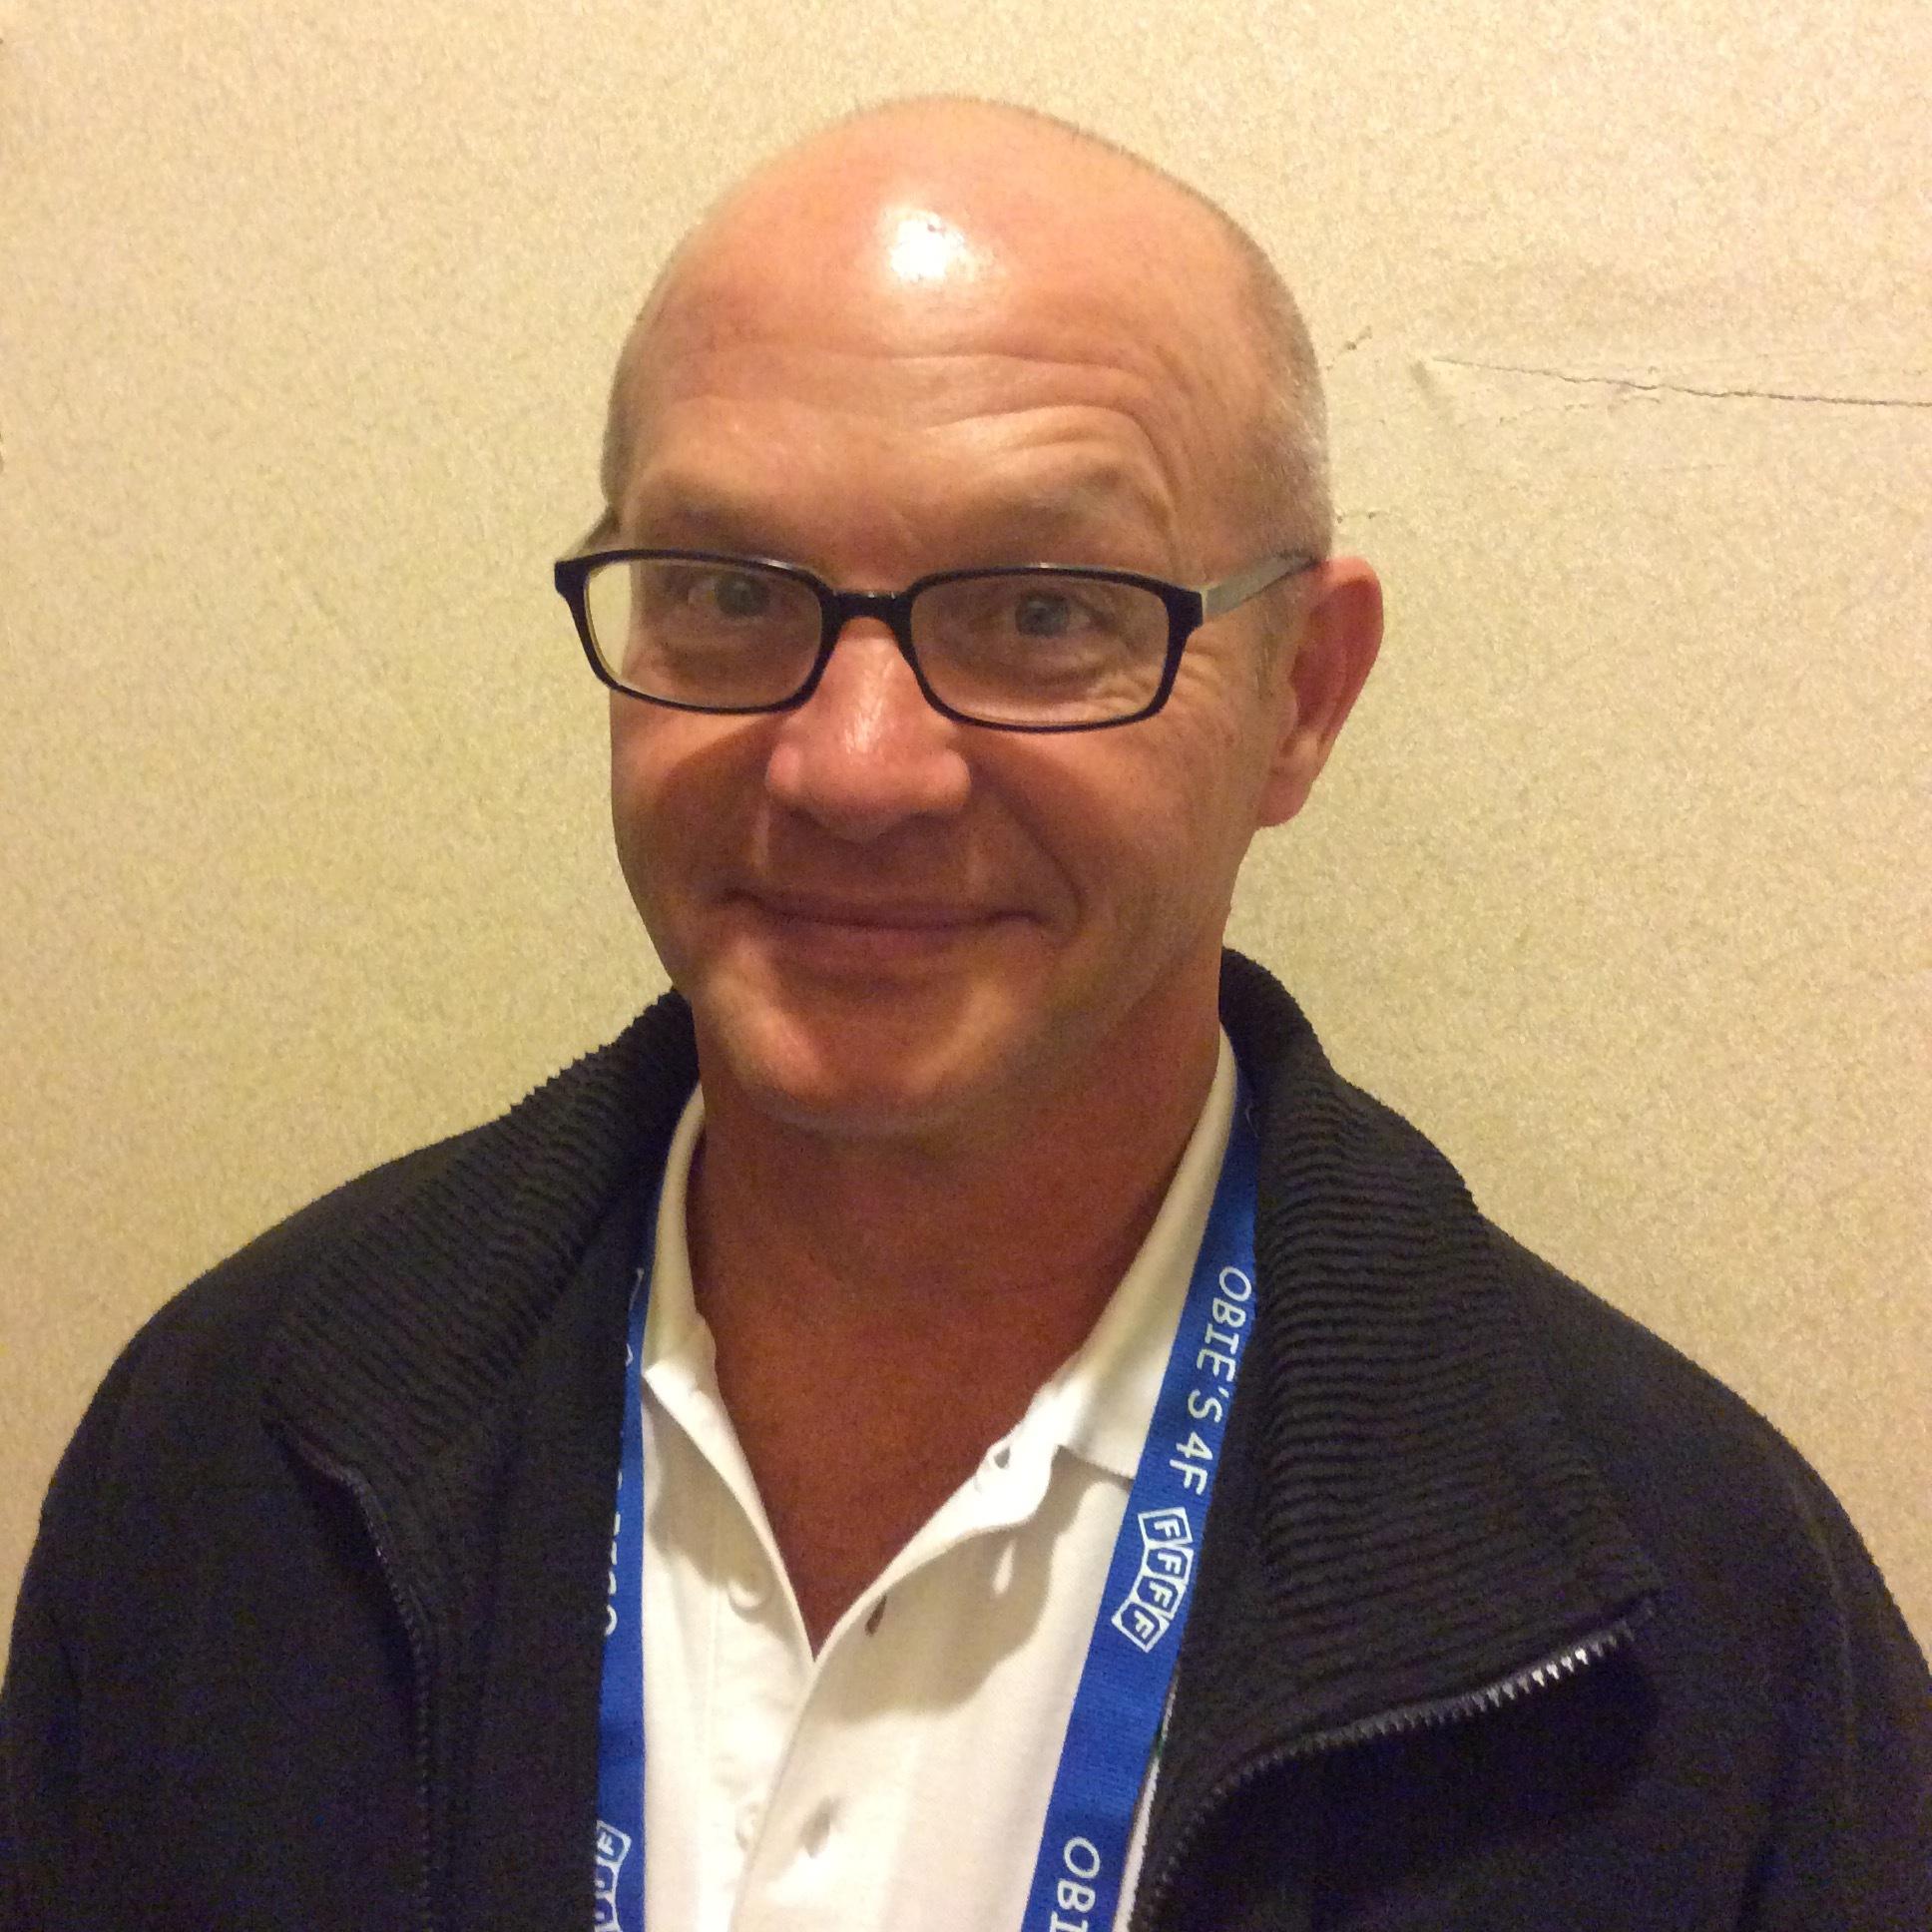 Geoff Williams